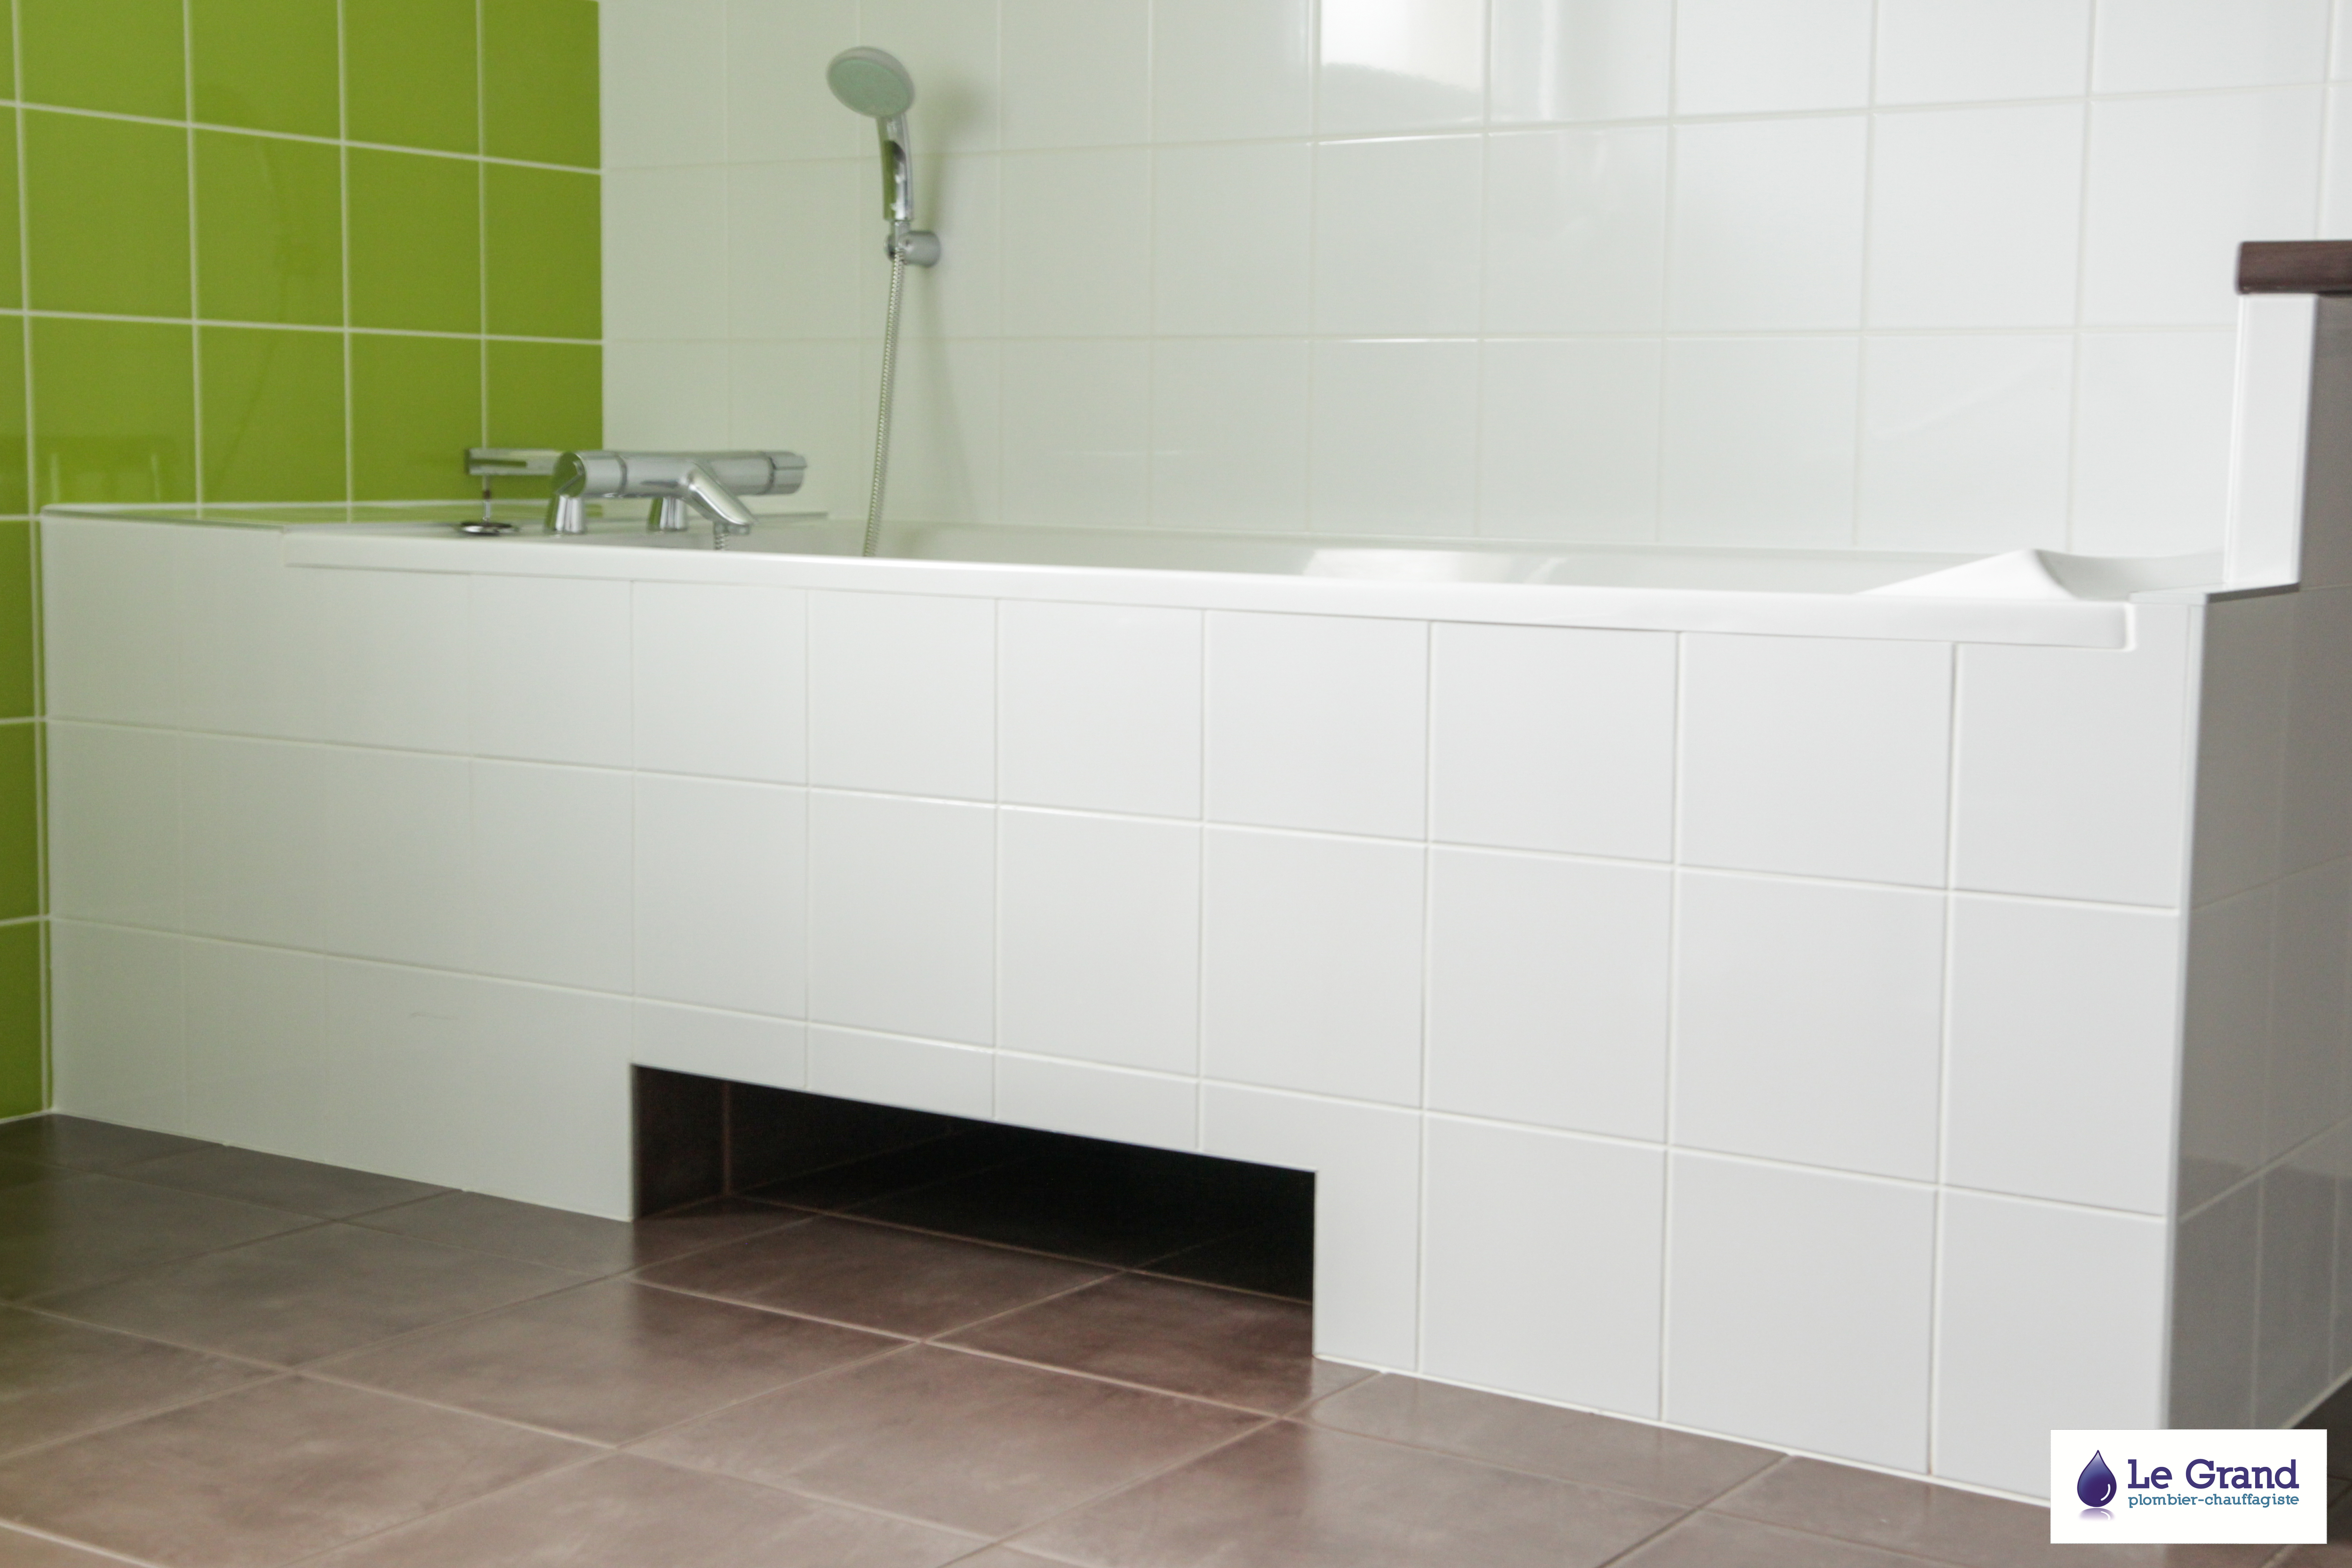 Salle de bains rennes pmr le grand plomberie chauffage for Salle de bain grand carrelage